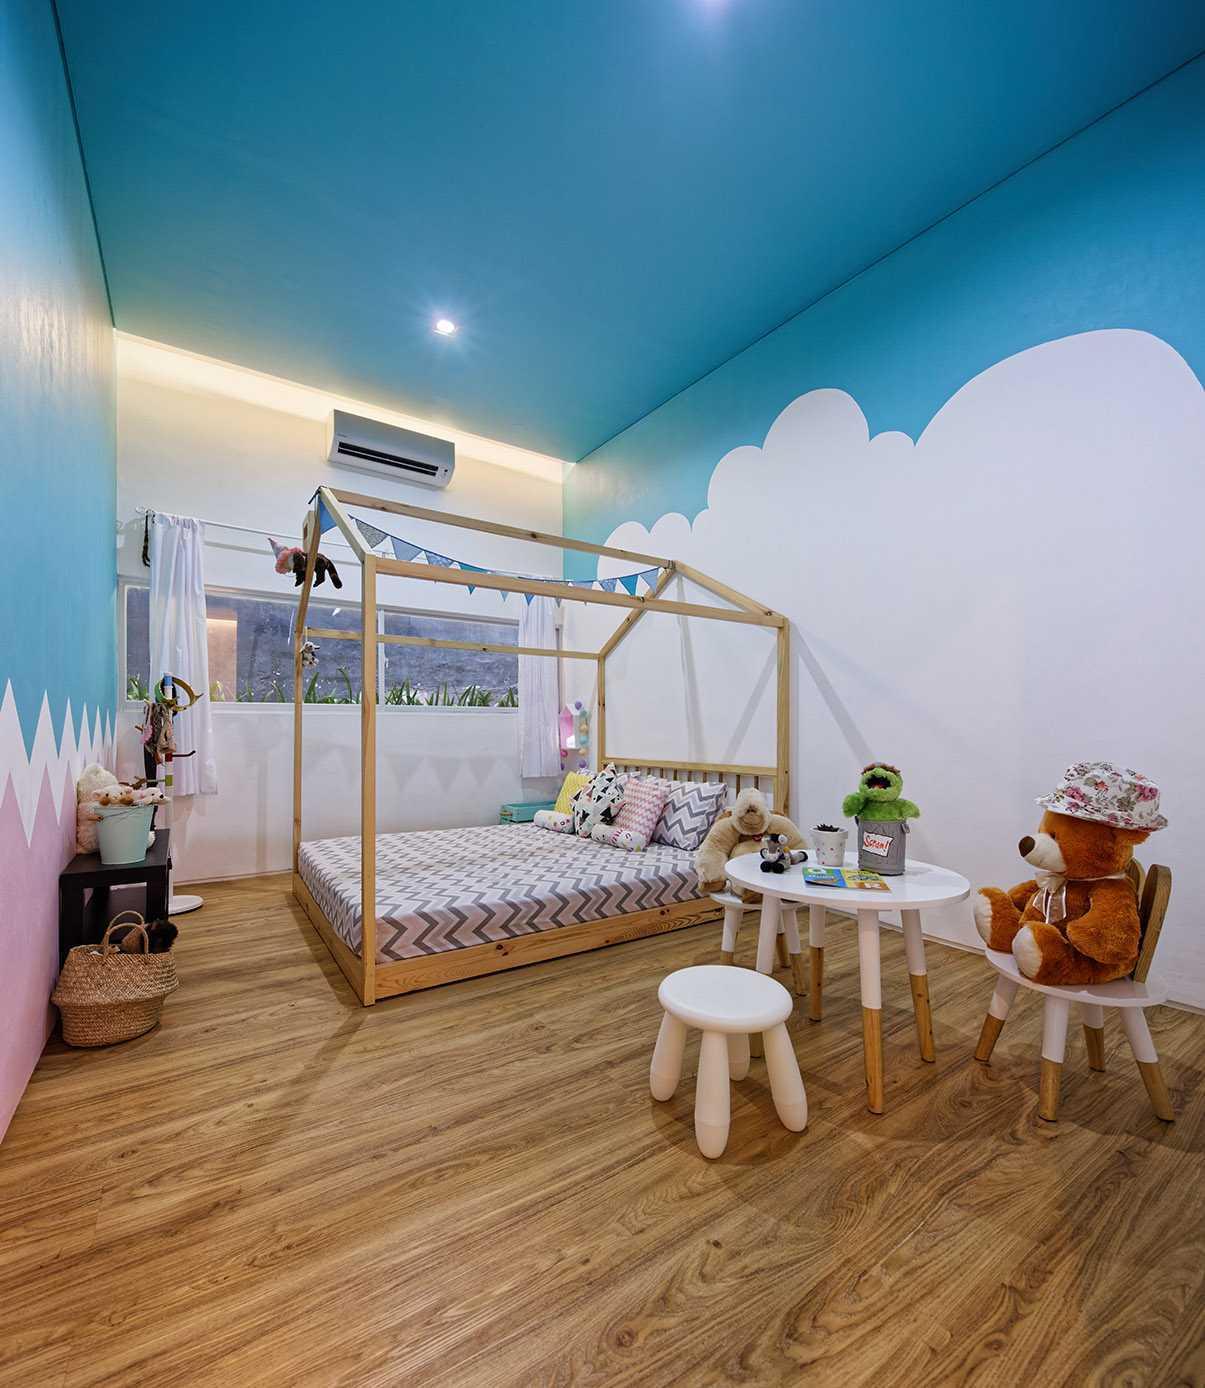 Inset House di Jatibening, Bekasi karya Delution Architect tahun 2016 (Sumber: arsitag.com)